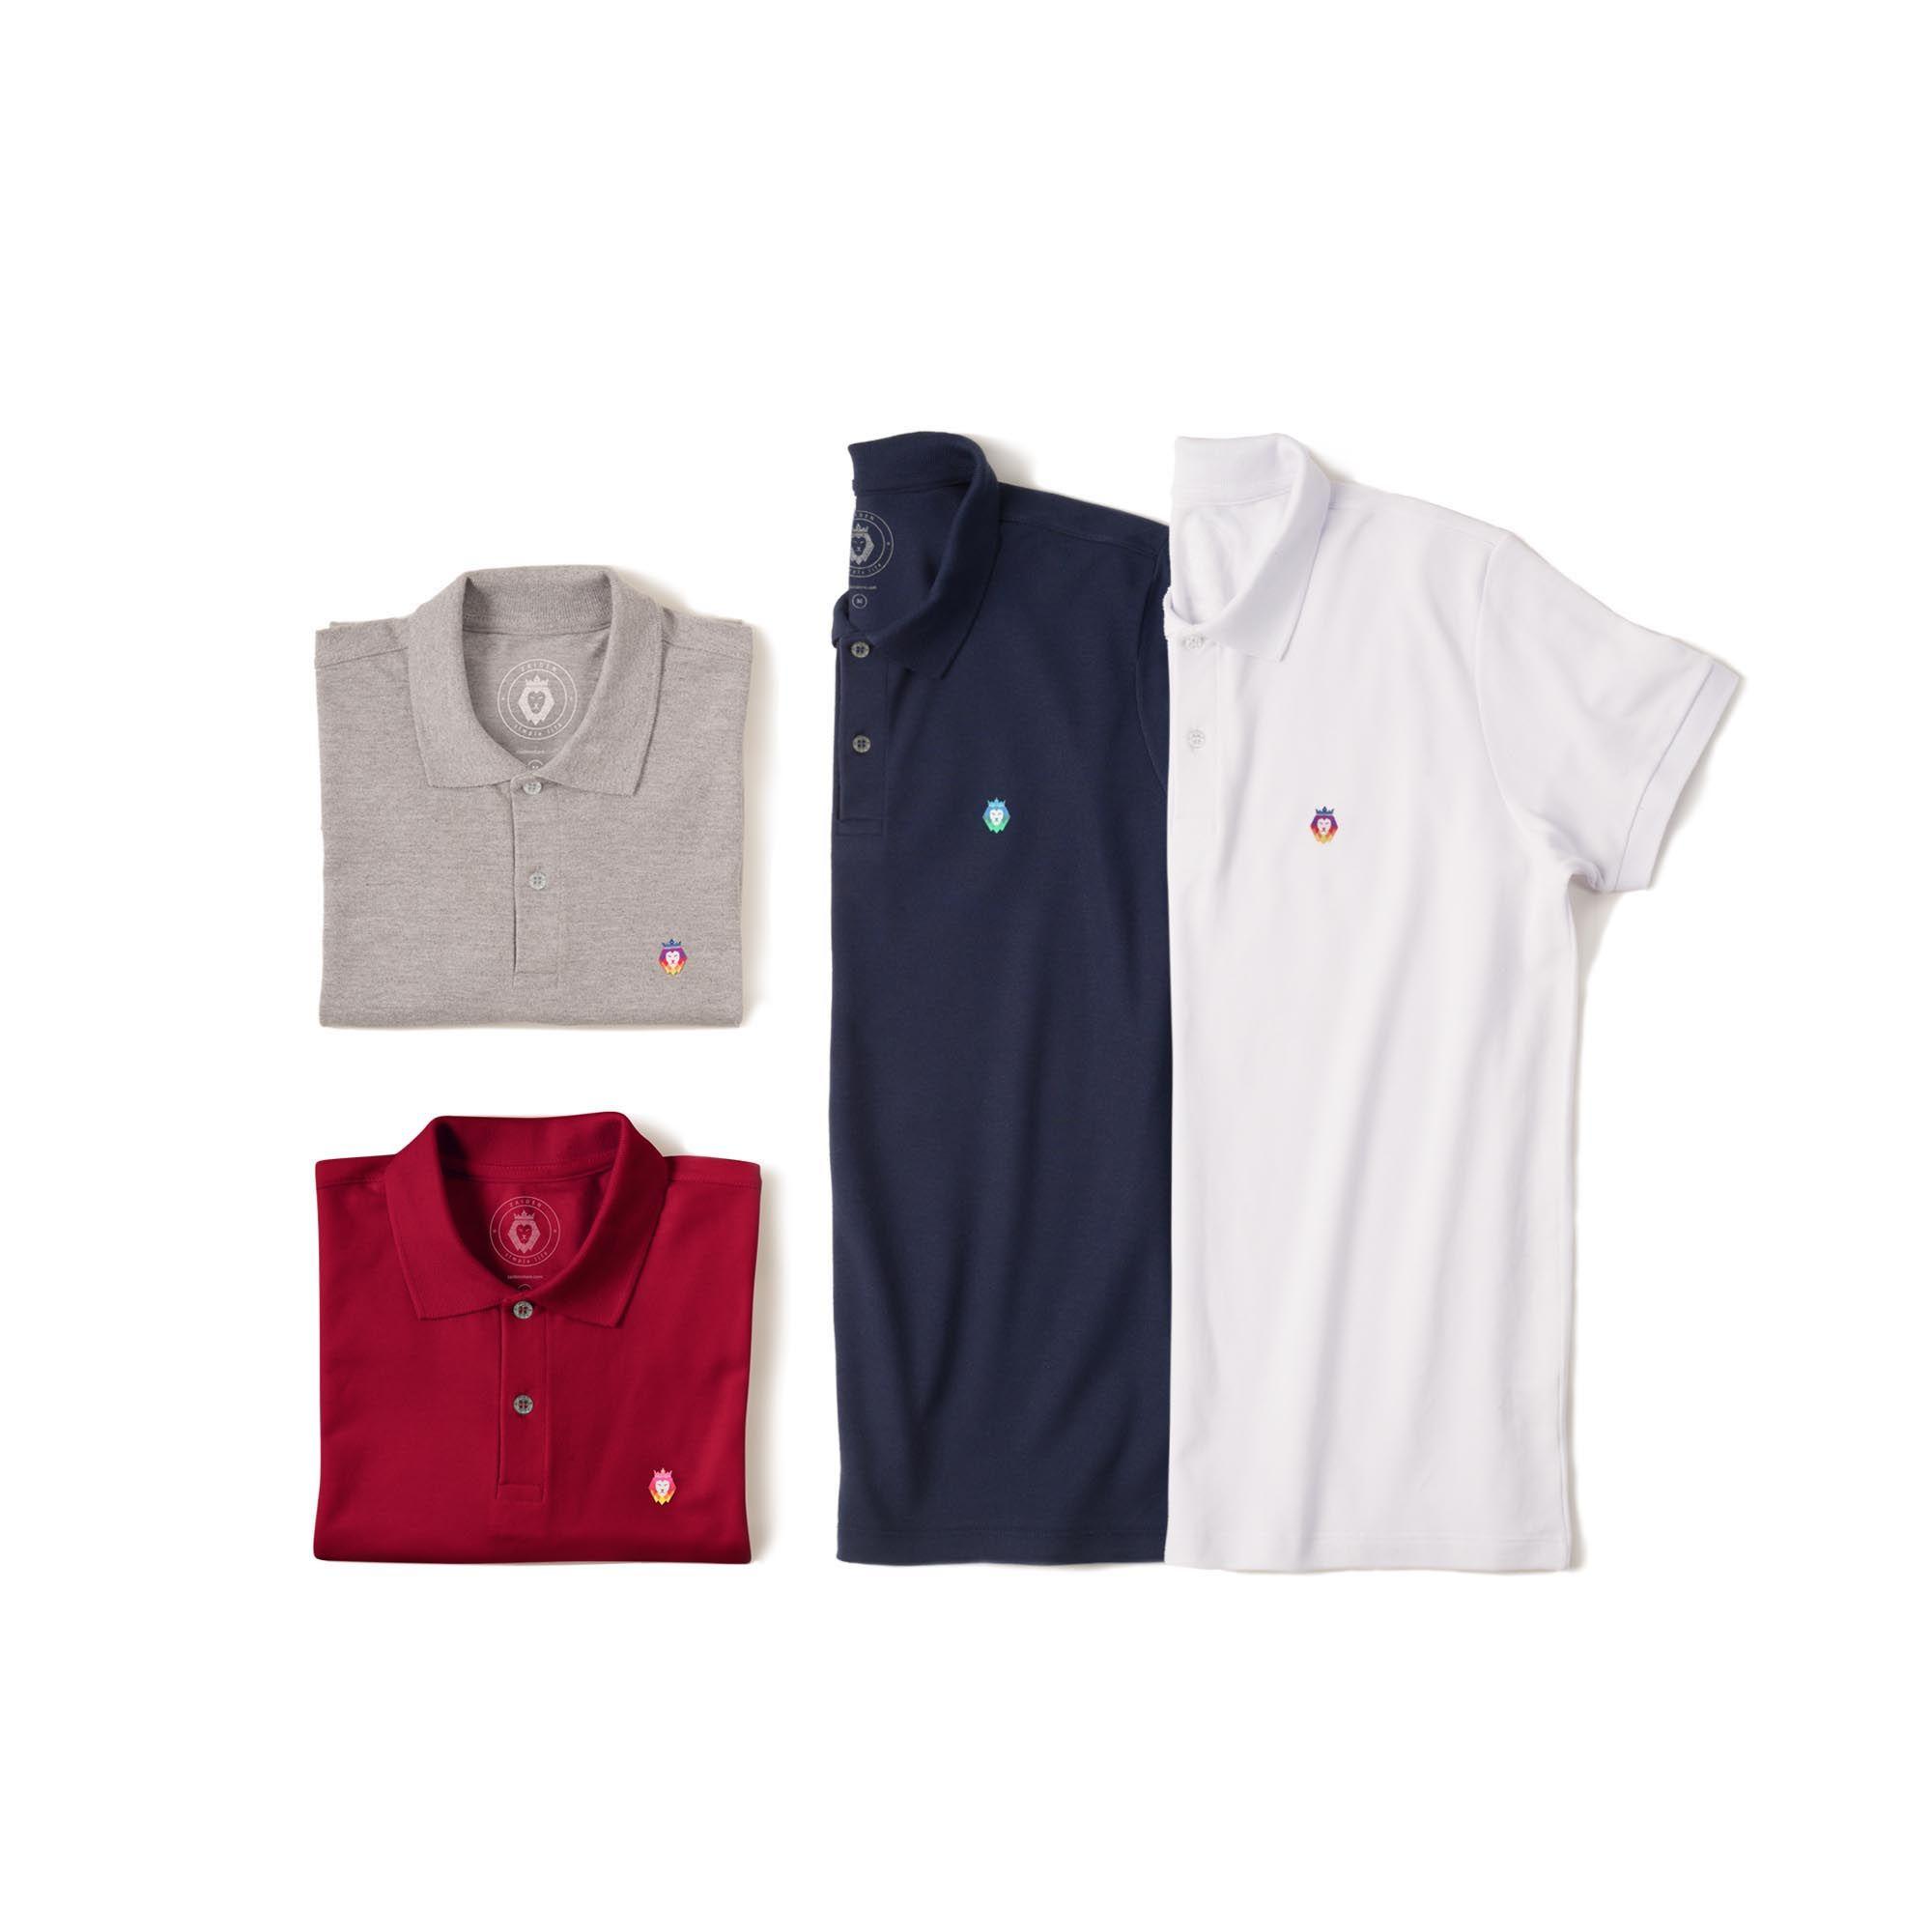 d97c2039b ... Kit 4 Camisas Polo Basic Zaiden Mescla Bordô Azul Marinho Branca  Masculina